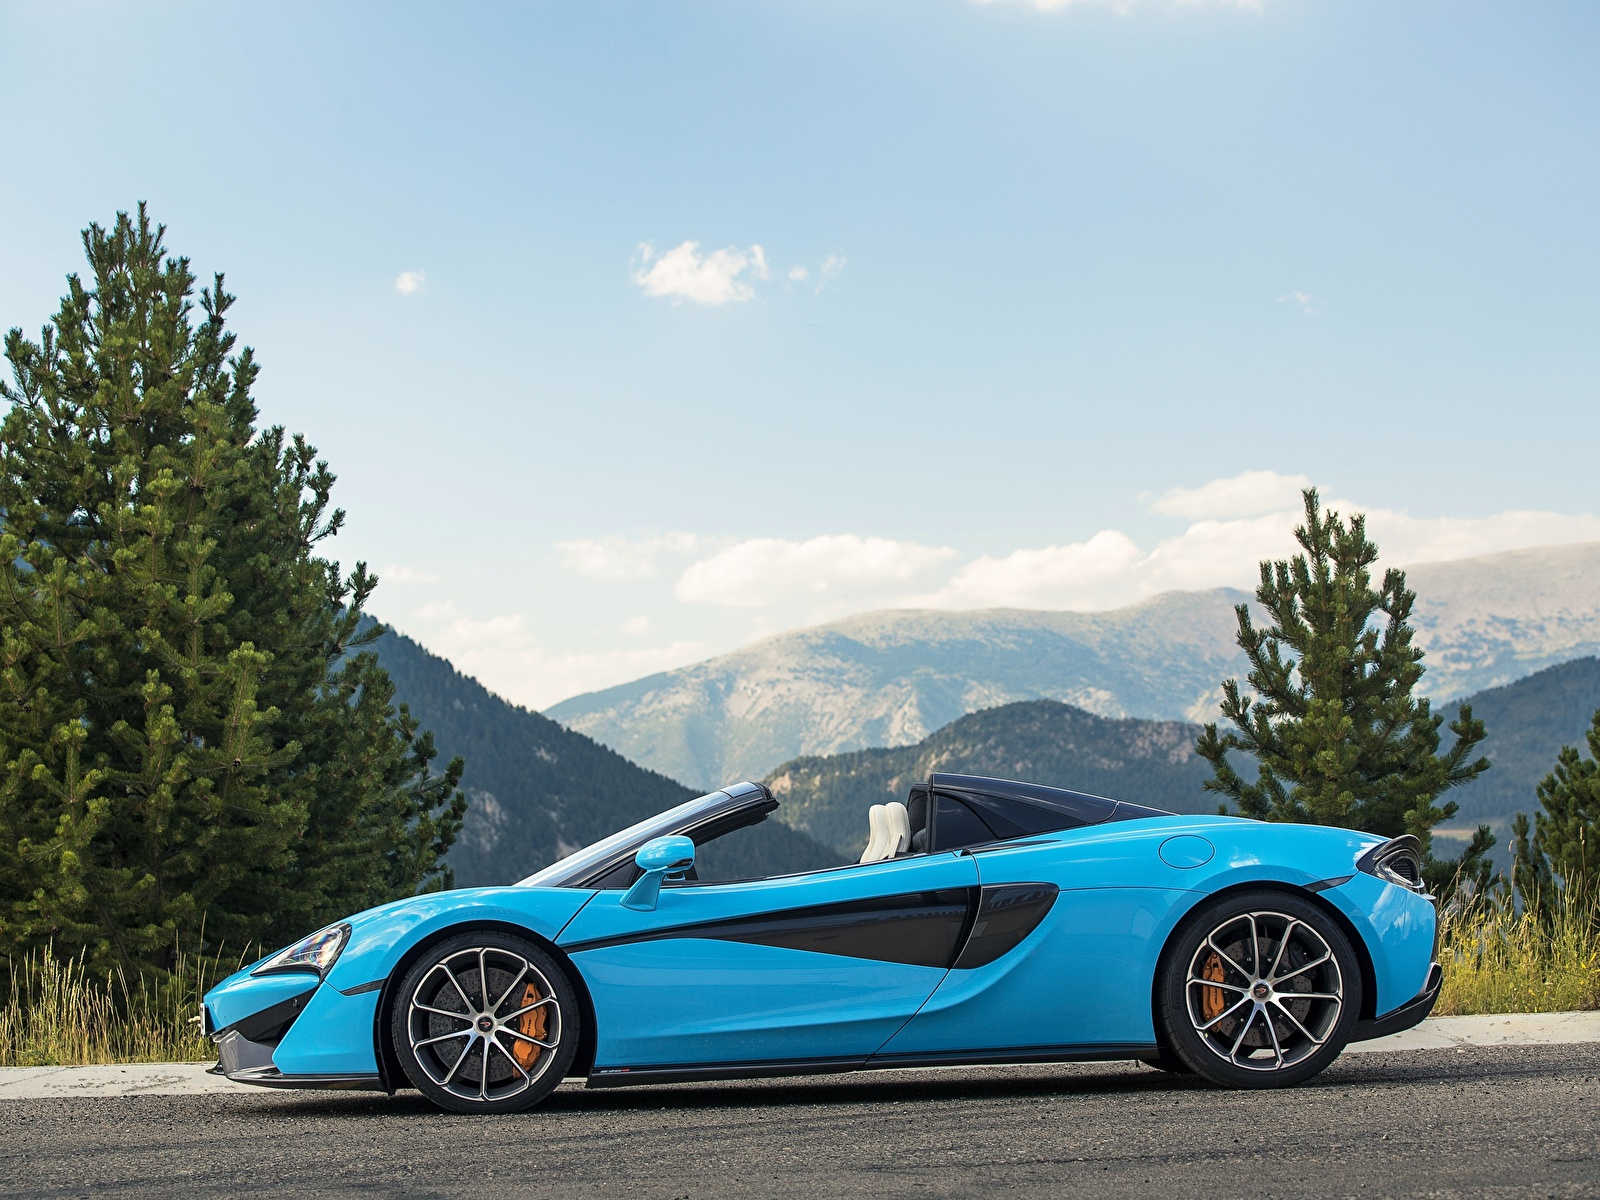 Картинка Макларен 2017 570S Spider Worldwide Родстер голубая Сбоку машины Металлик 1600x1200 McLaren голубых голубые Голубой авто машина автомобиль Автомобили